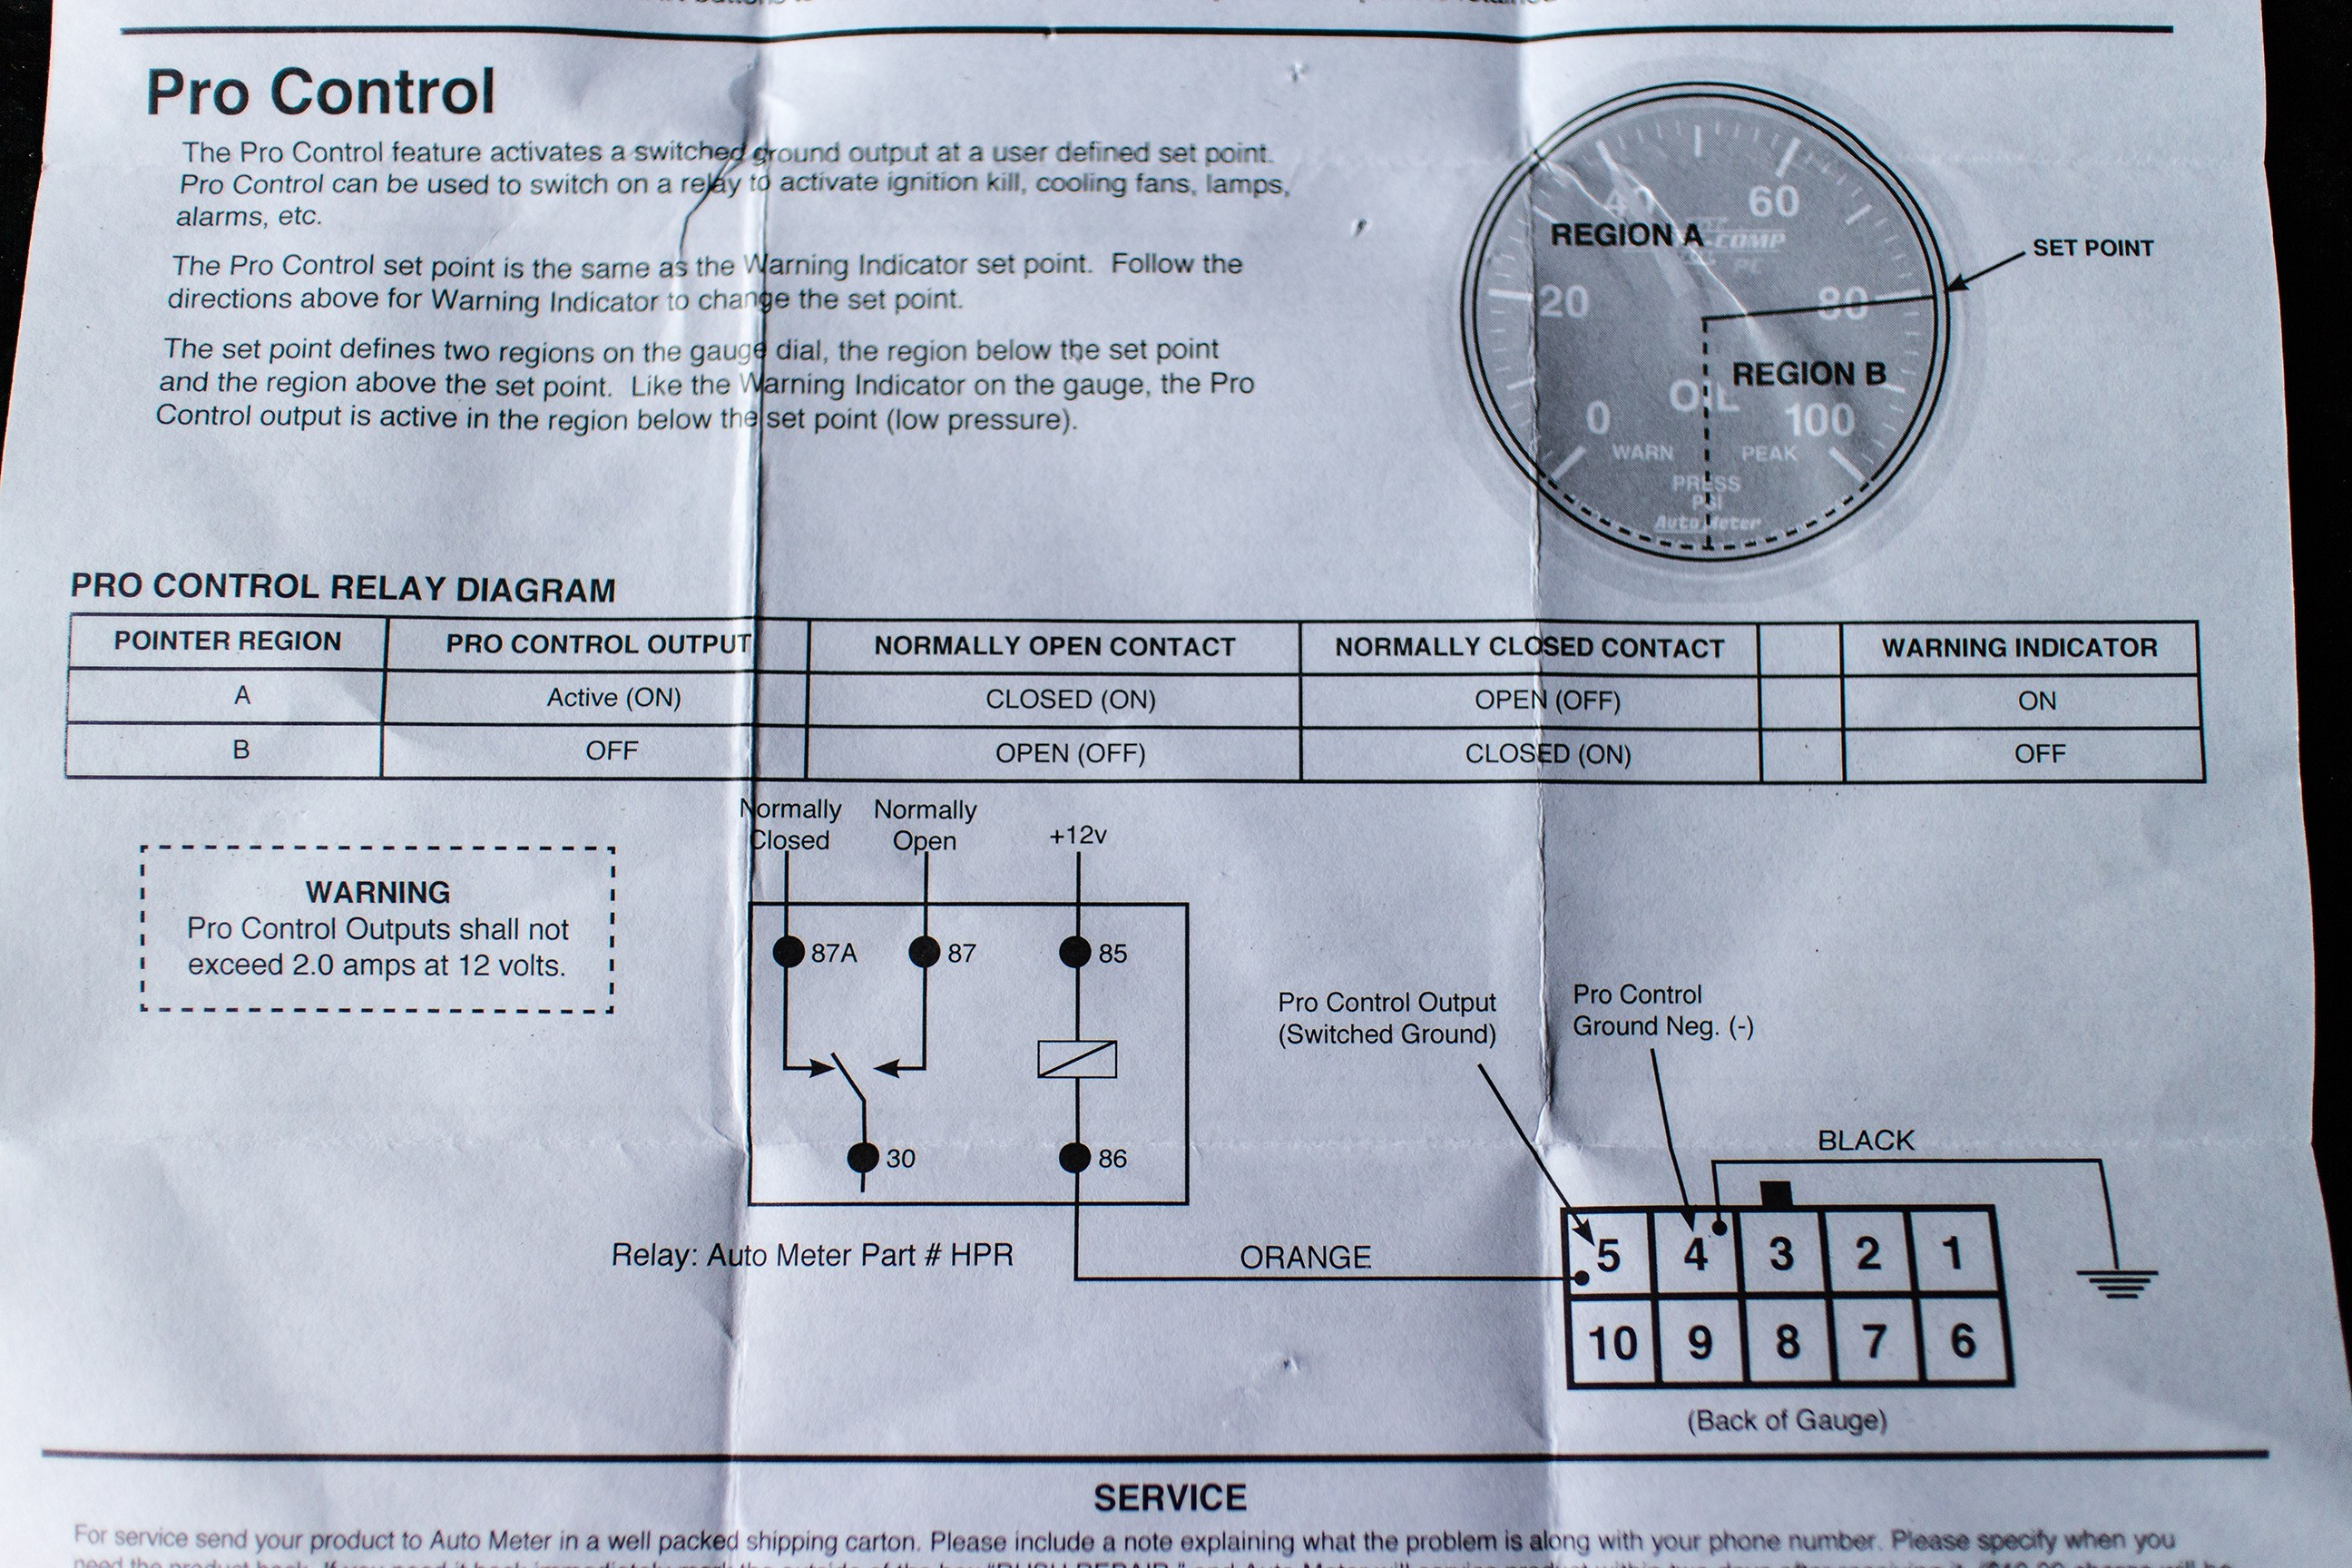 Autometer Tach Wiring Diagram Elegant Autometer Tachometer Wiring Diagram & Autometer Pro